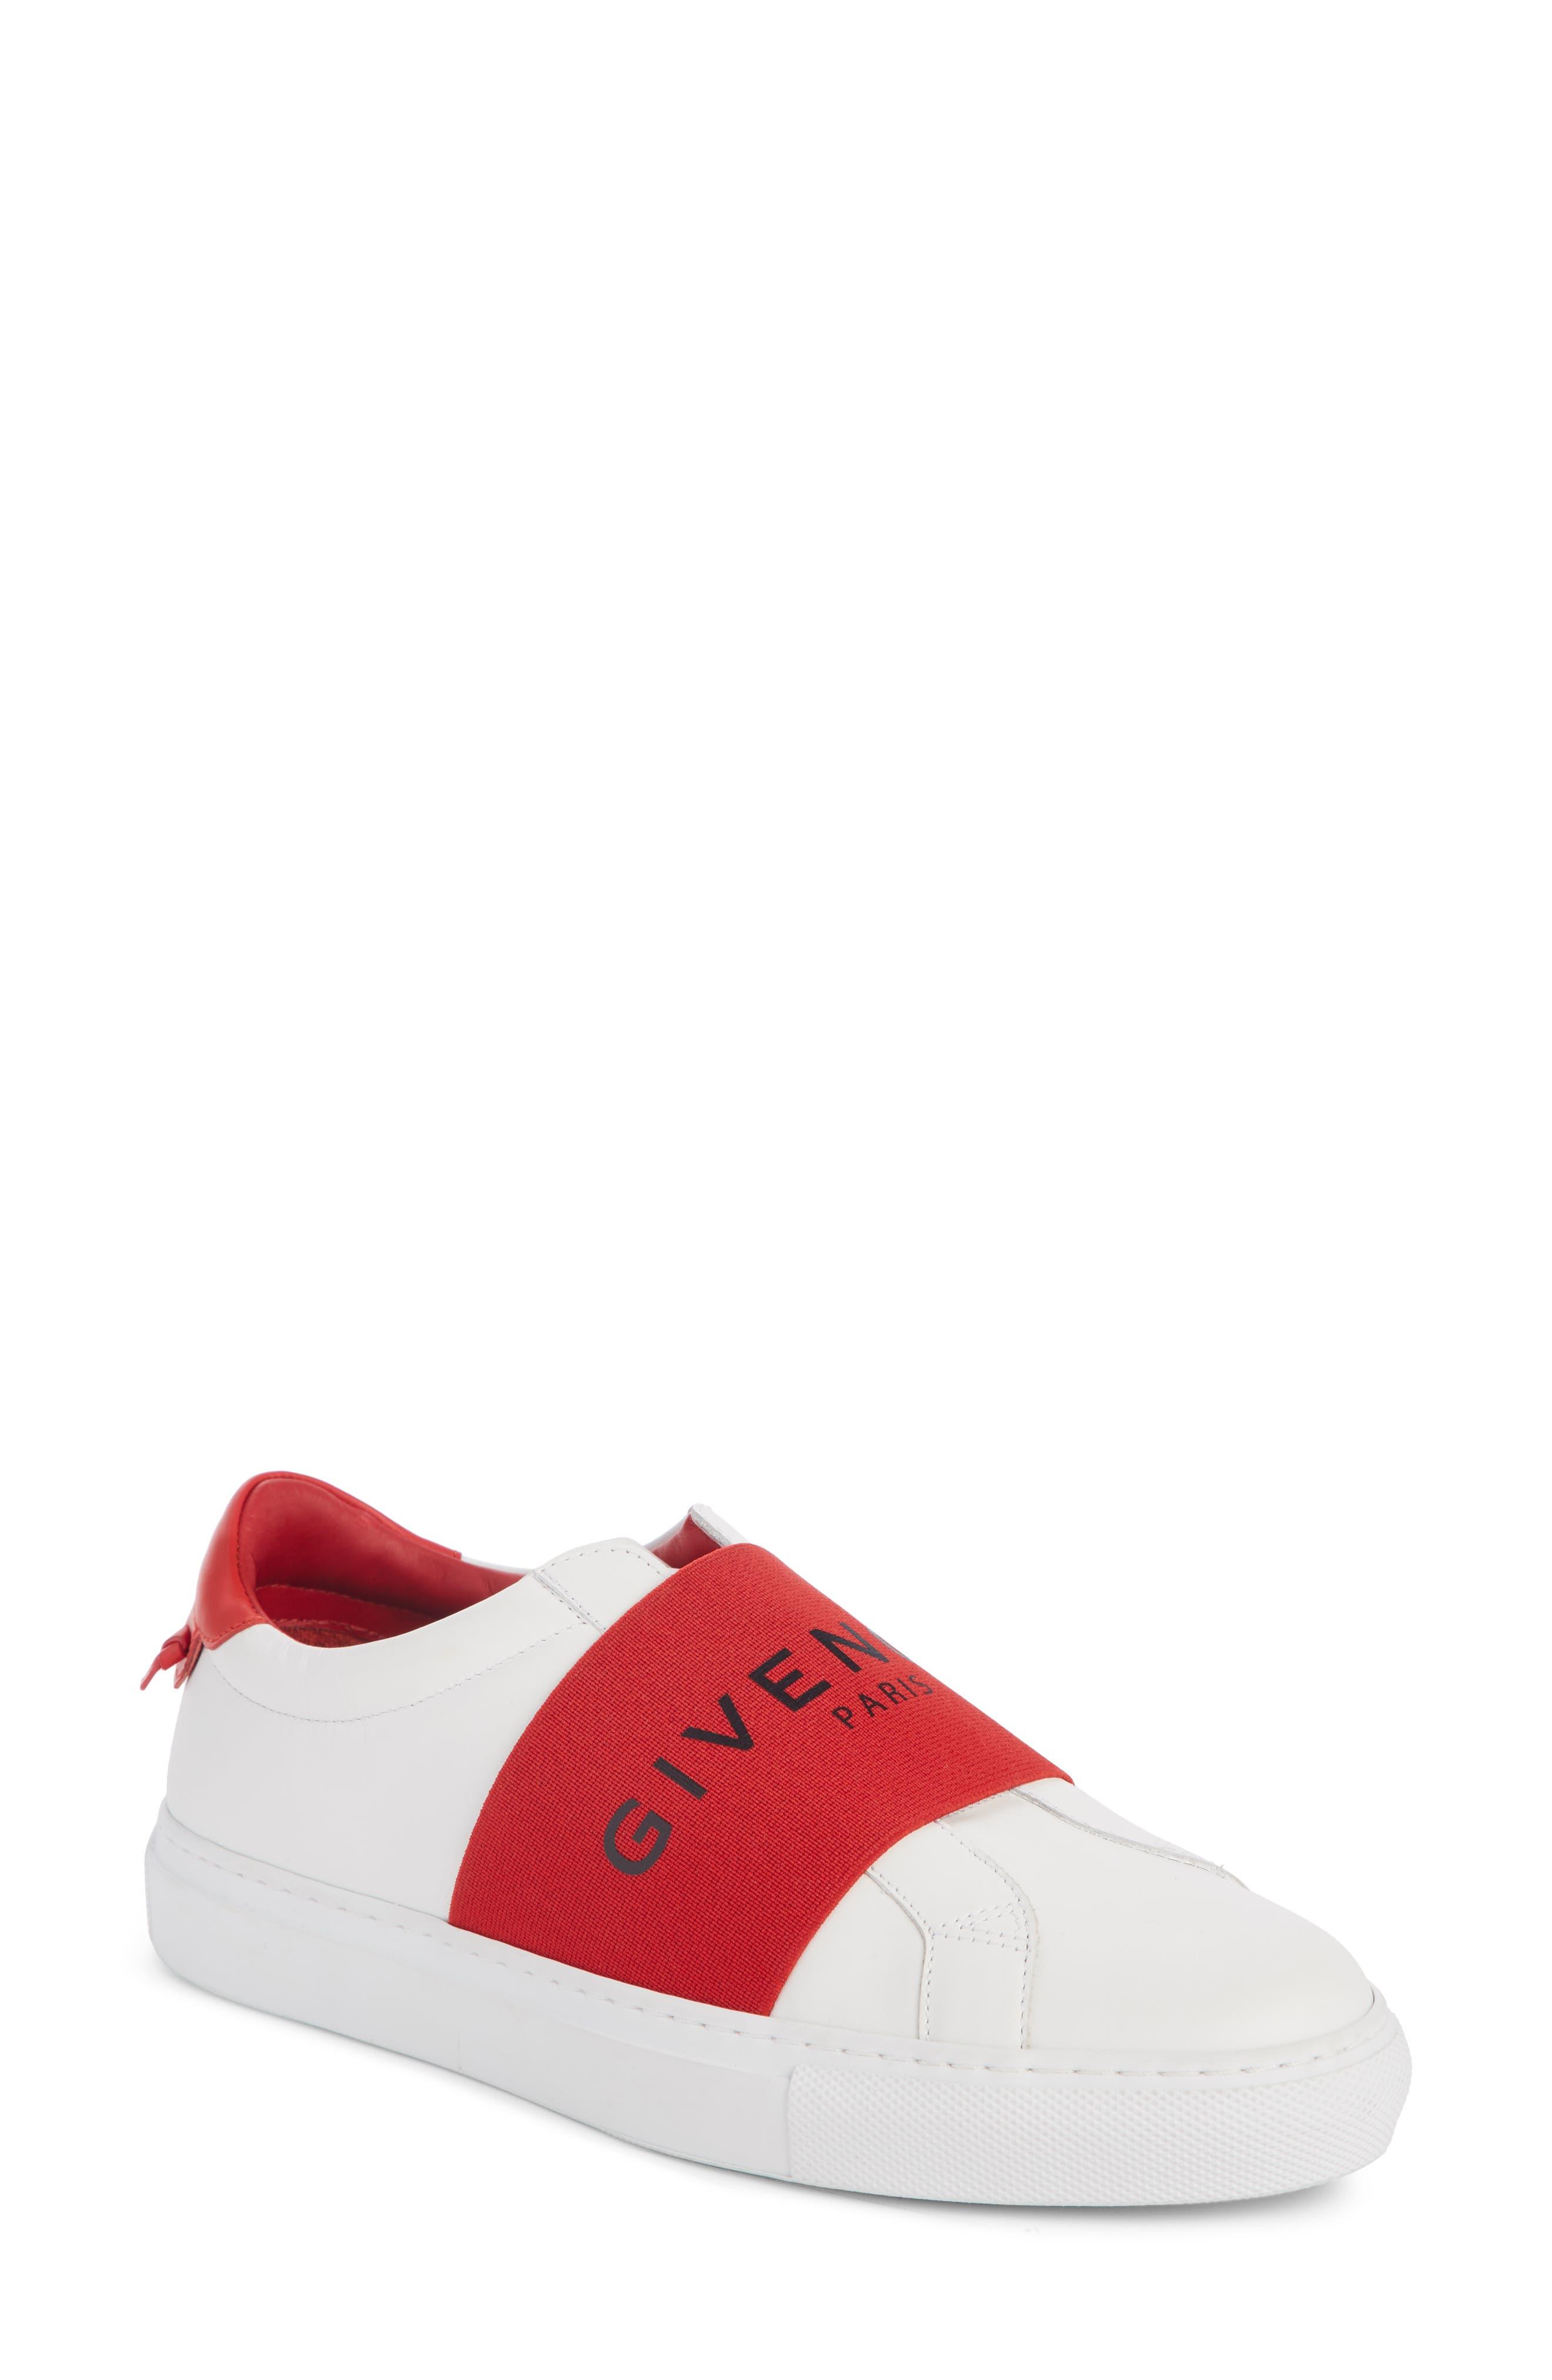 Givenchy Urban Street Logo Band Sneaker - White